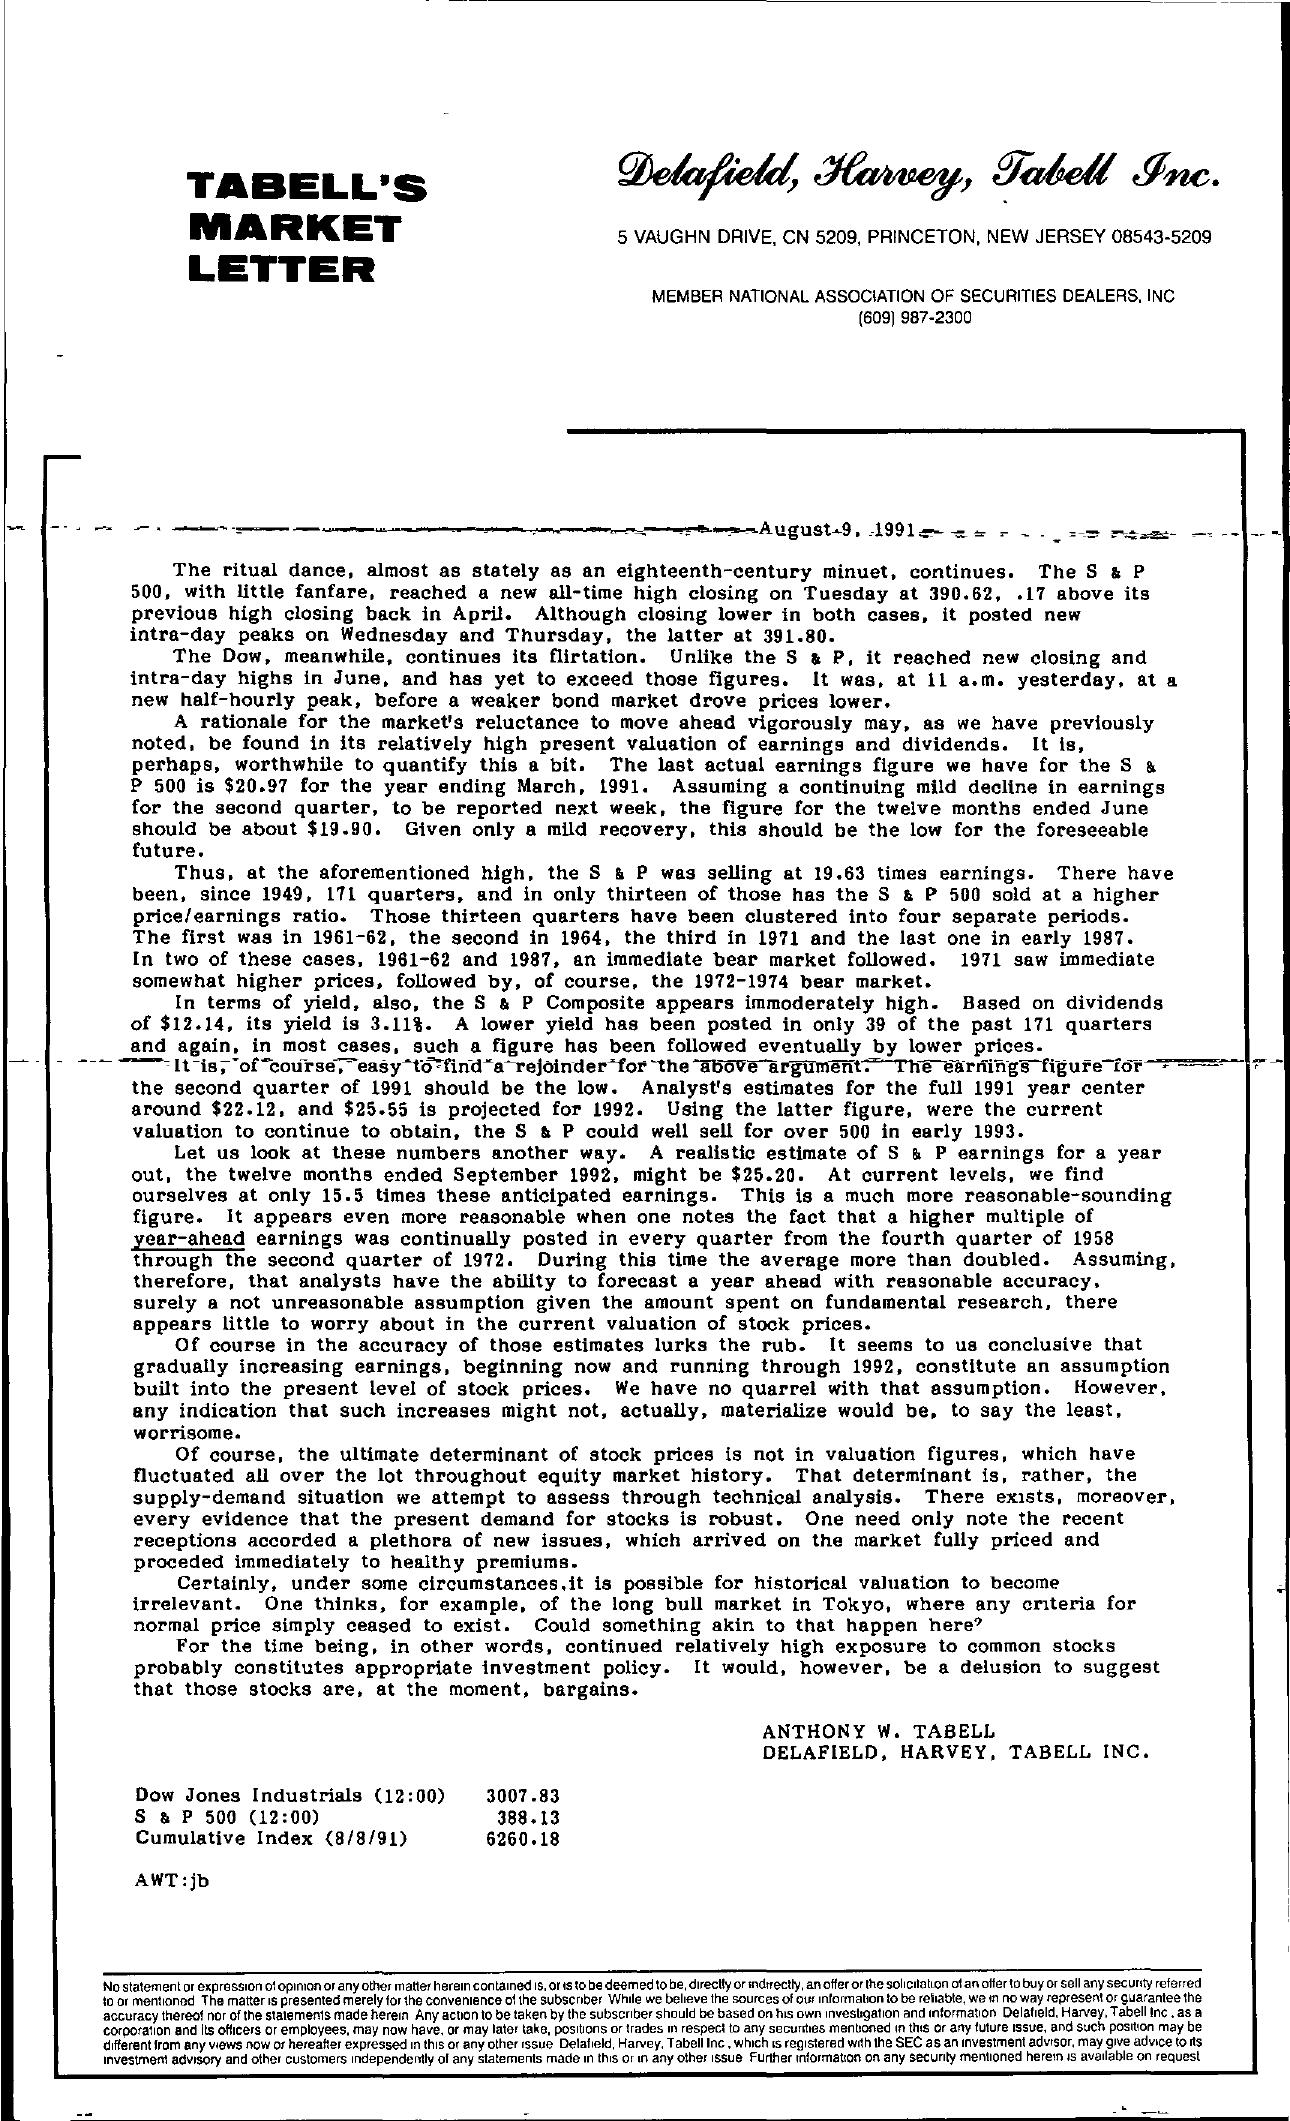 Tabell's Market Letter - August 09, 1991